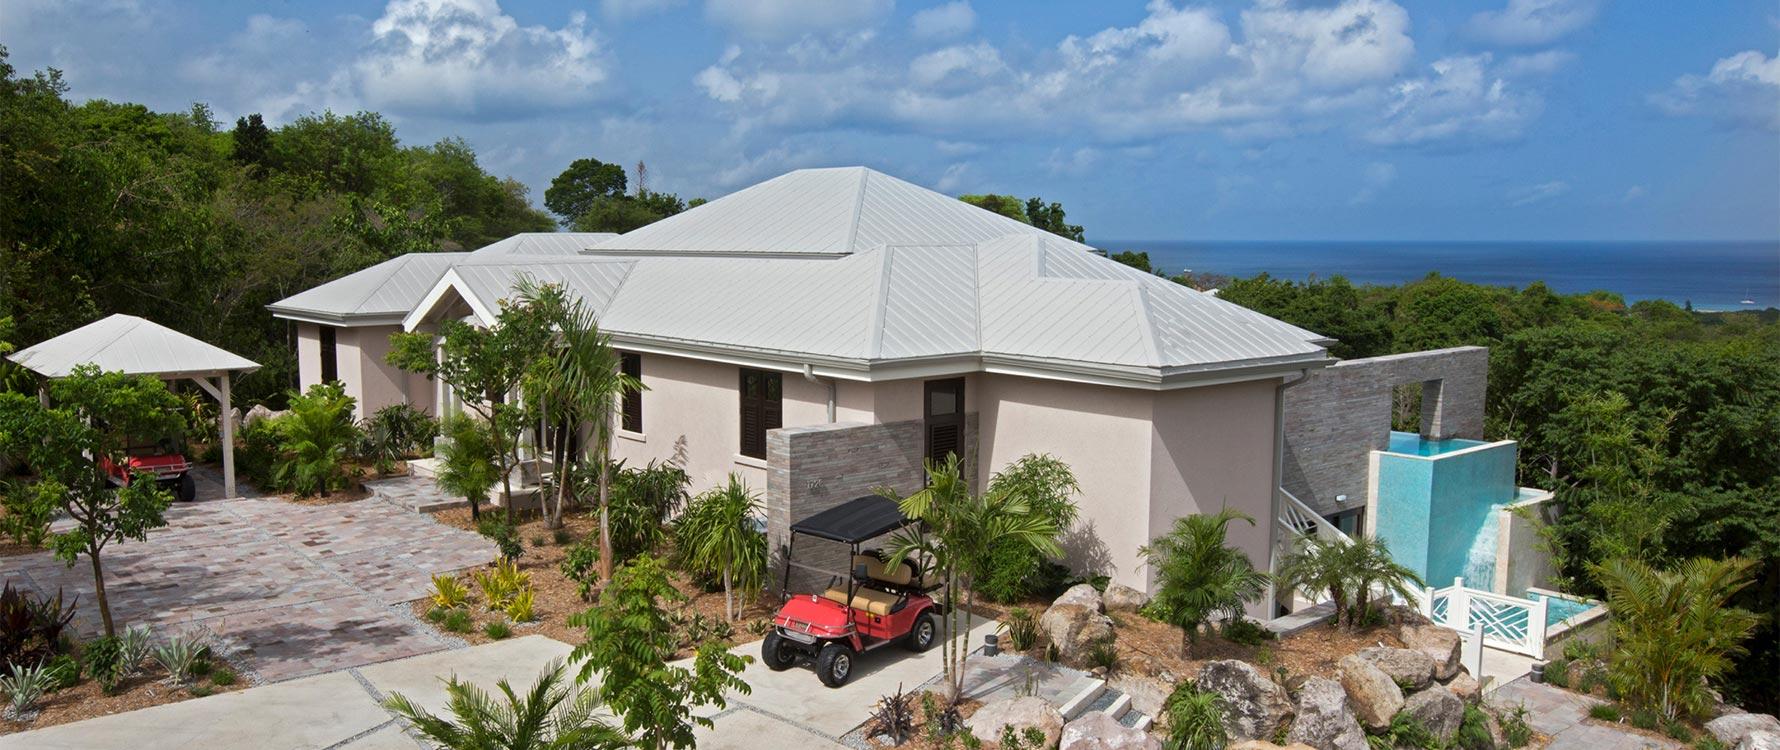 Aerial View - Exterior